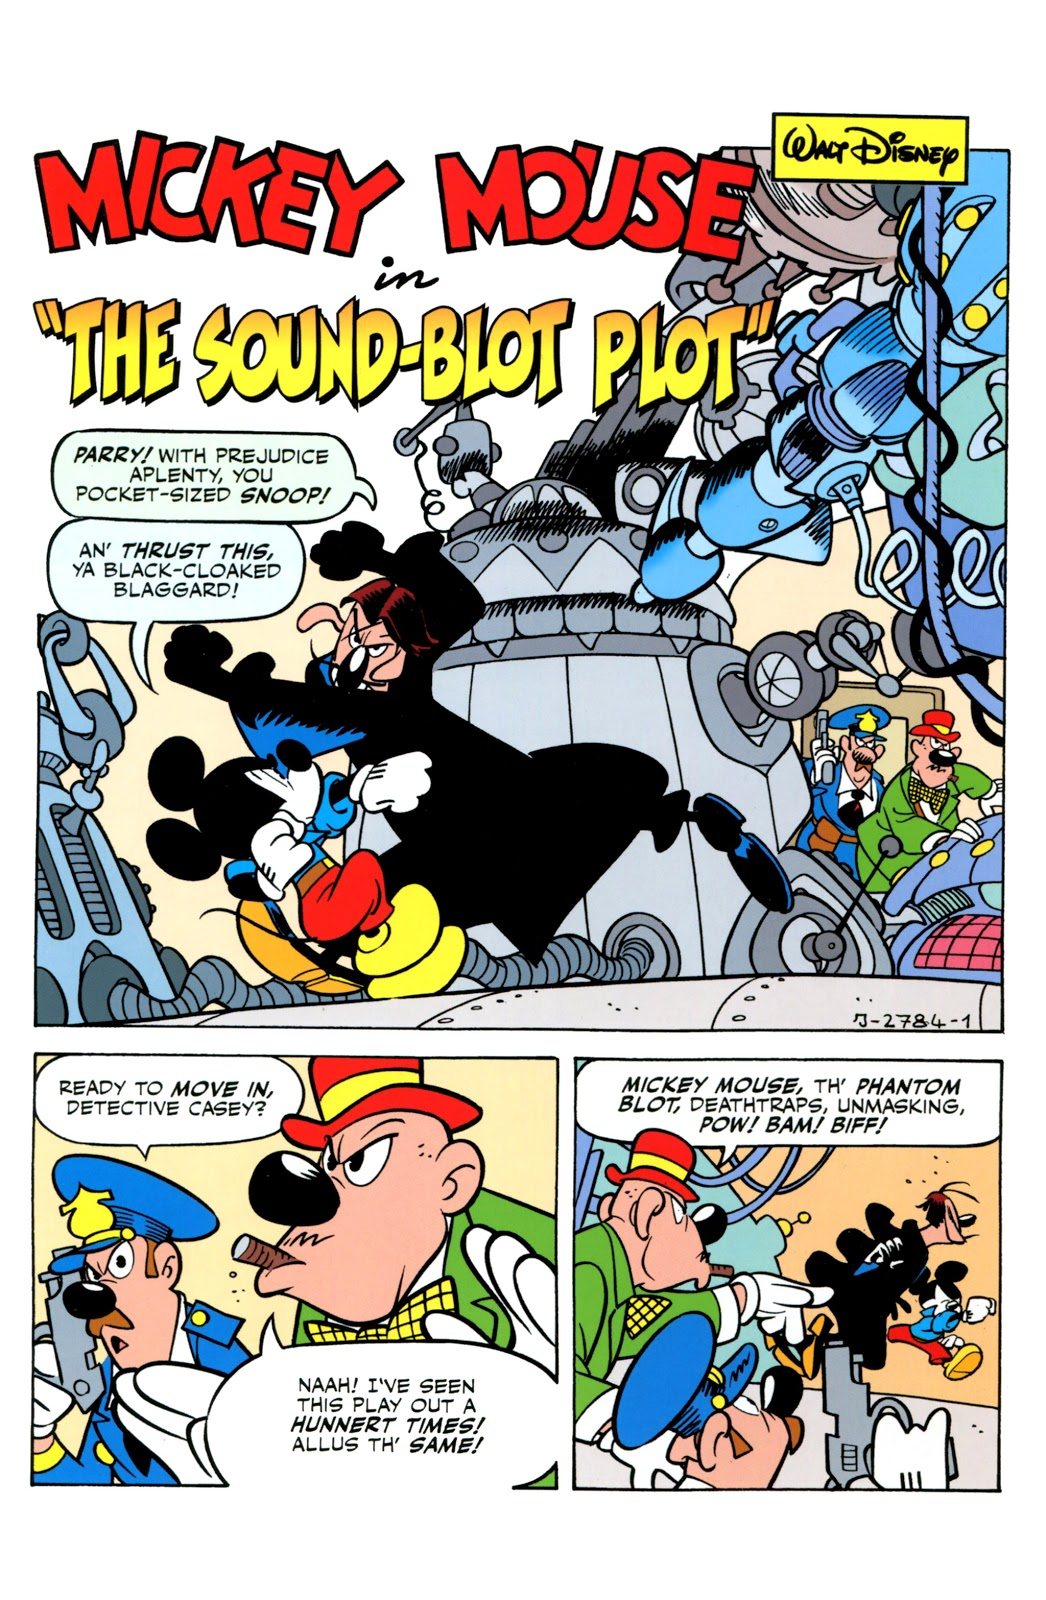 The Sound-Blot Plot